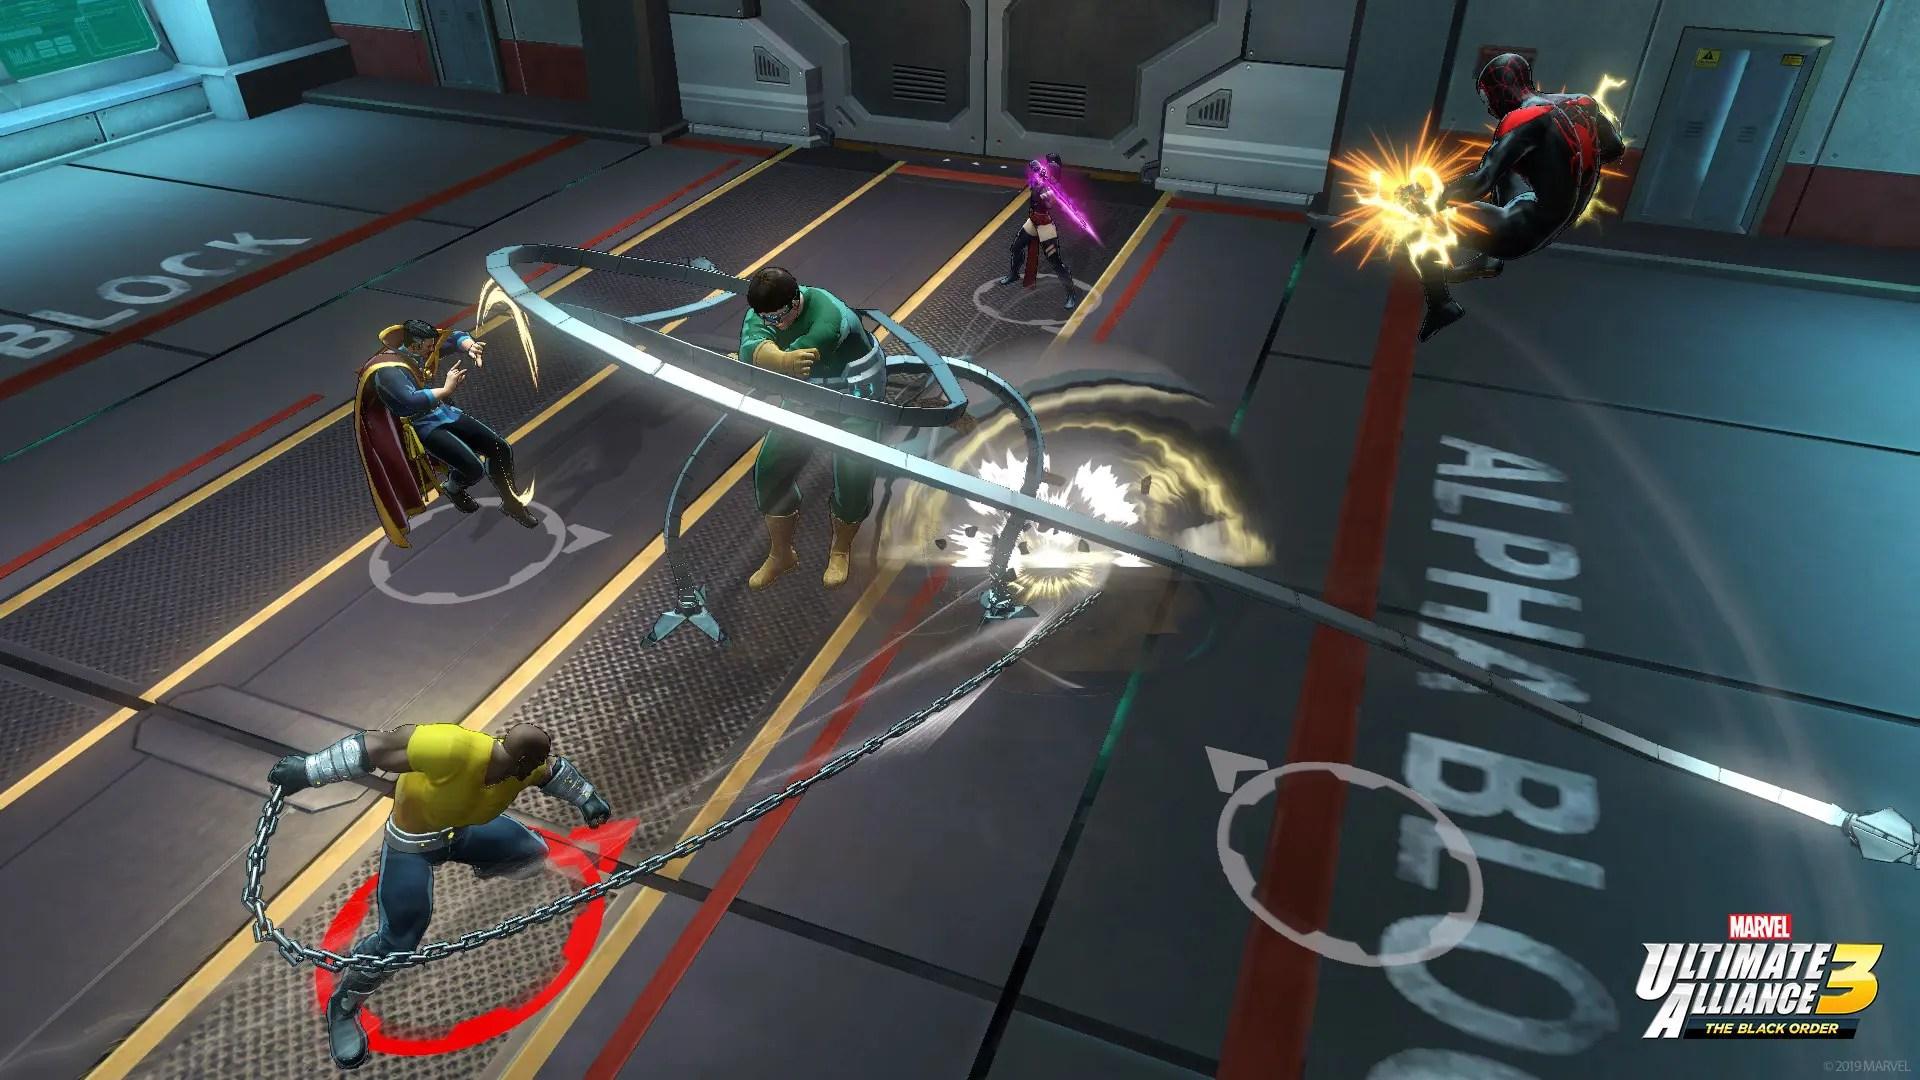 Marvel Ultimate Alliance 3: The Black Order E3 2019 Screenshot 2